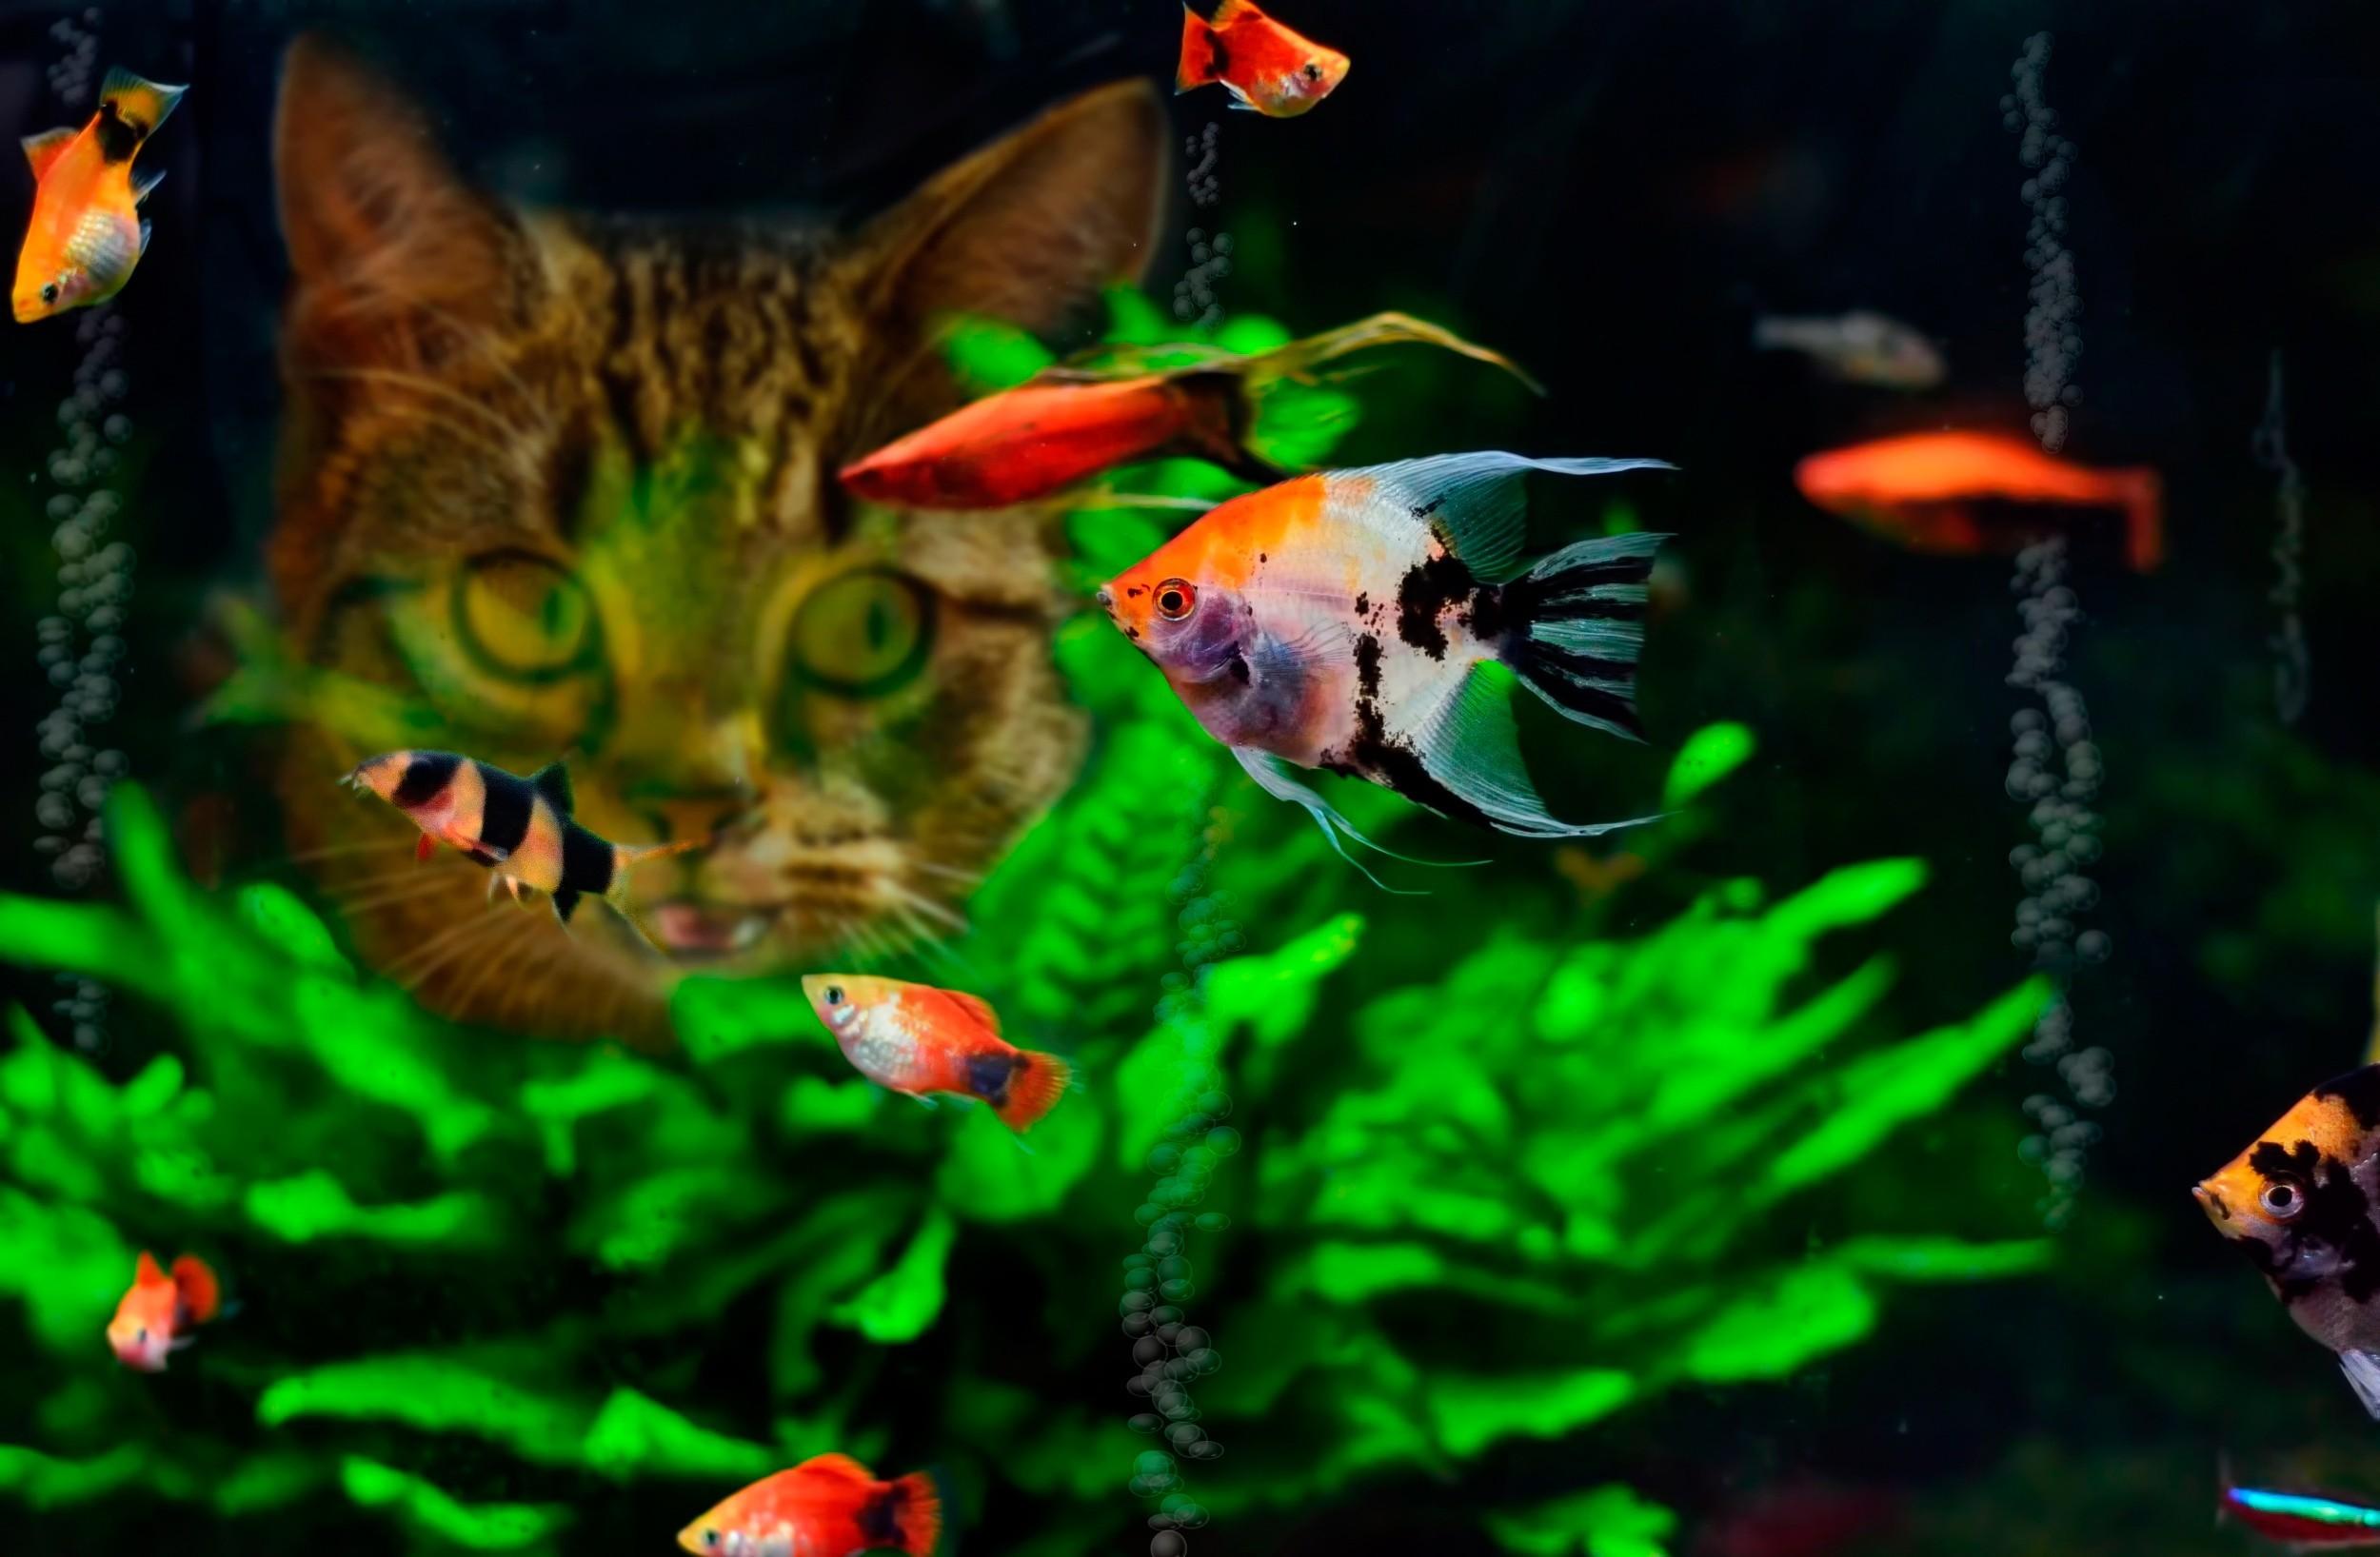 Hd Fish Live Wallpaper For Pc Poisson Fond D 233 Cran Hd Arri 232 Re Plan 2500x1636 Id